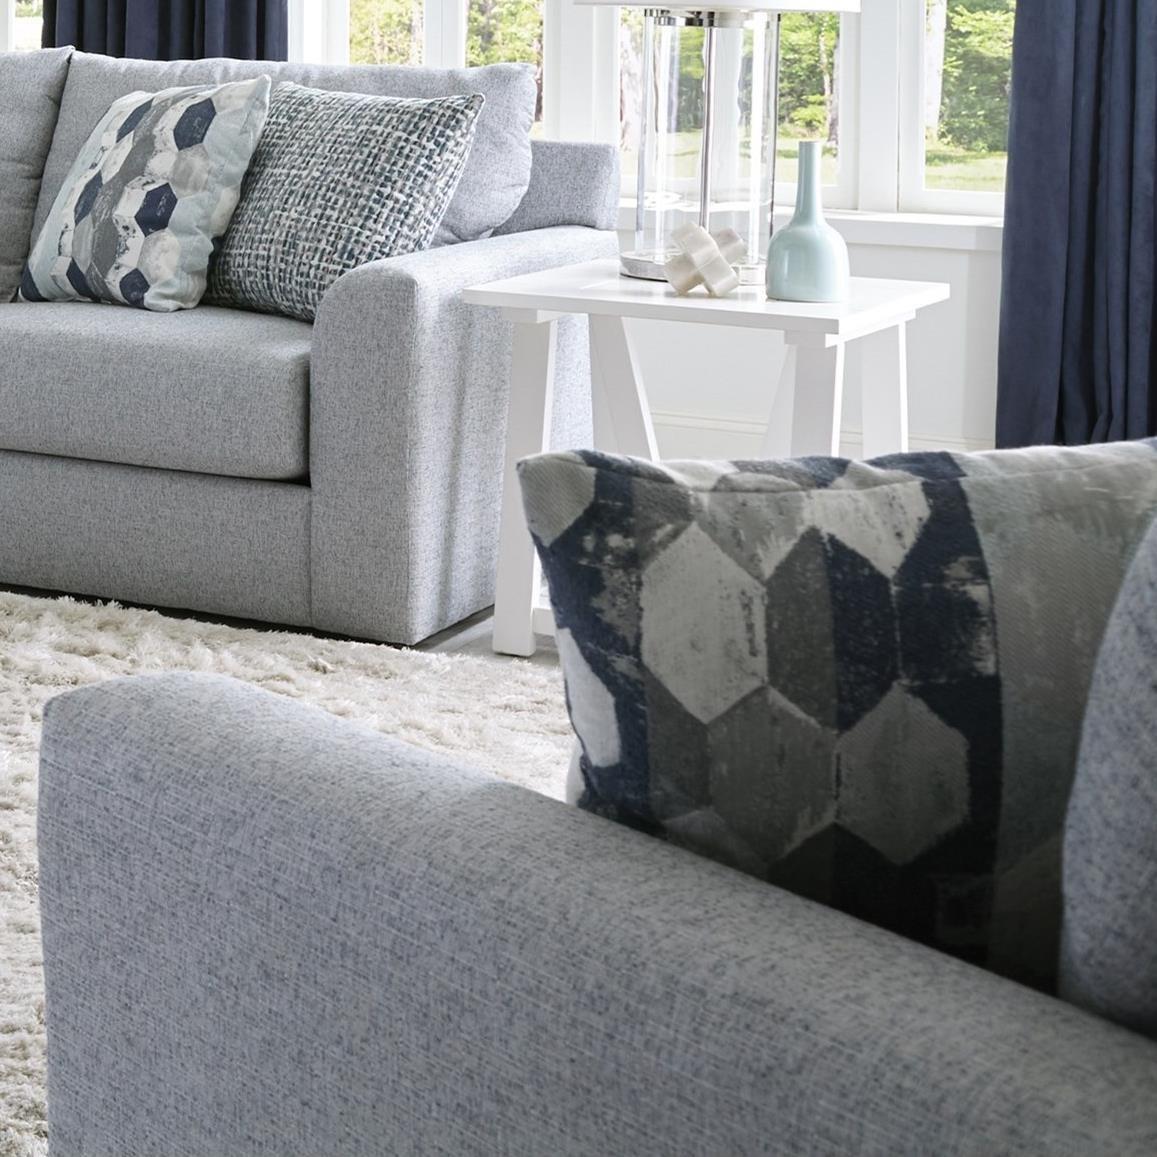 Hooten Chair and a Half by Jackson Furniture at Bullard Furniture